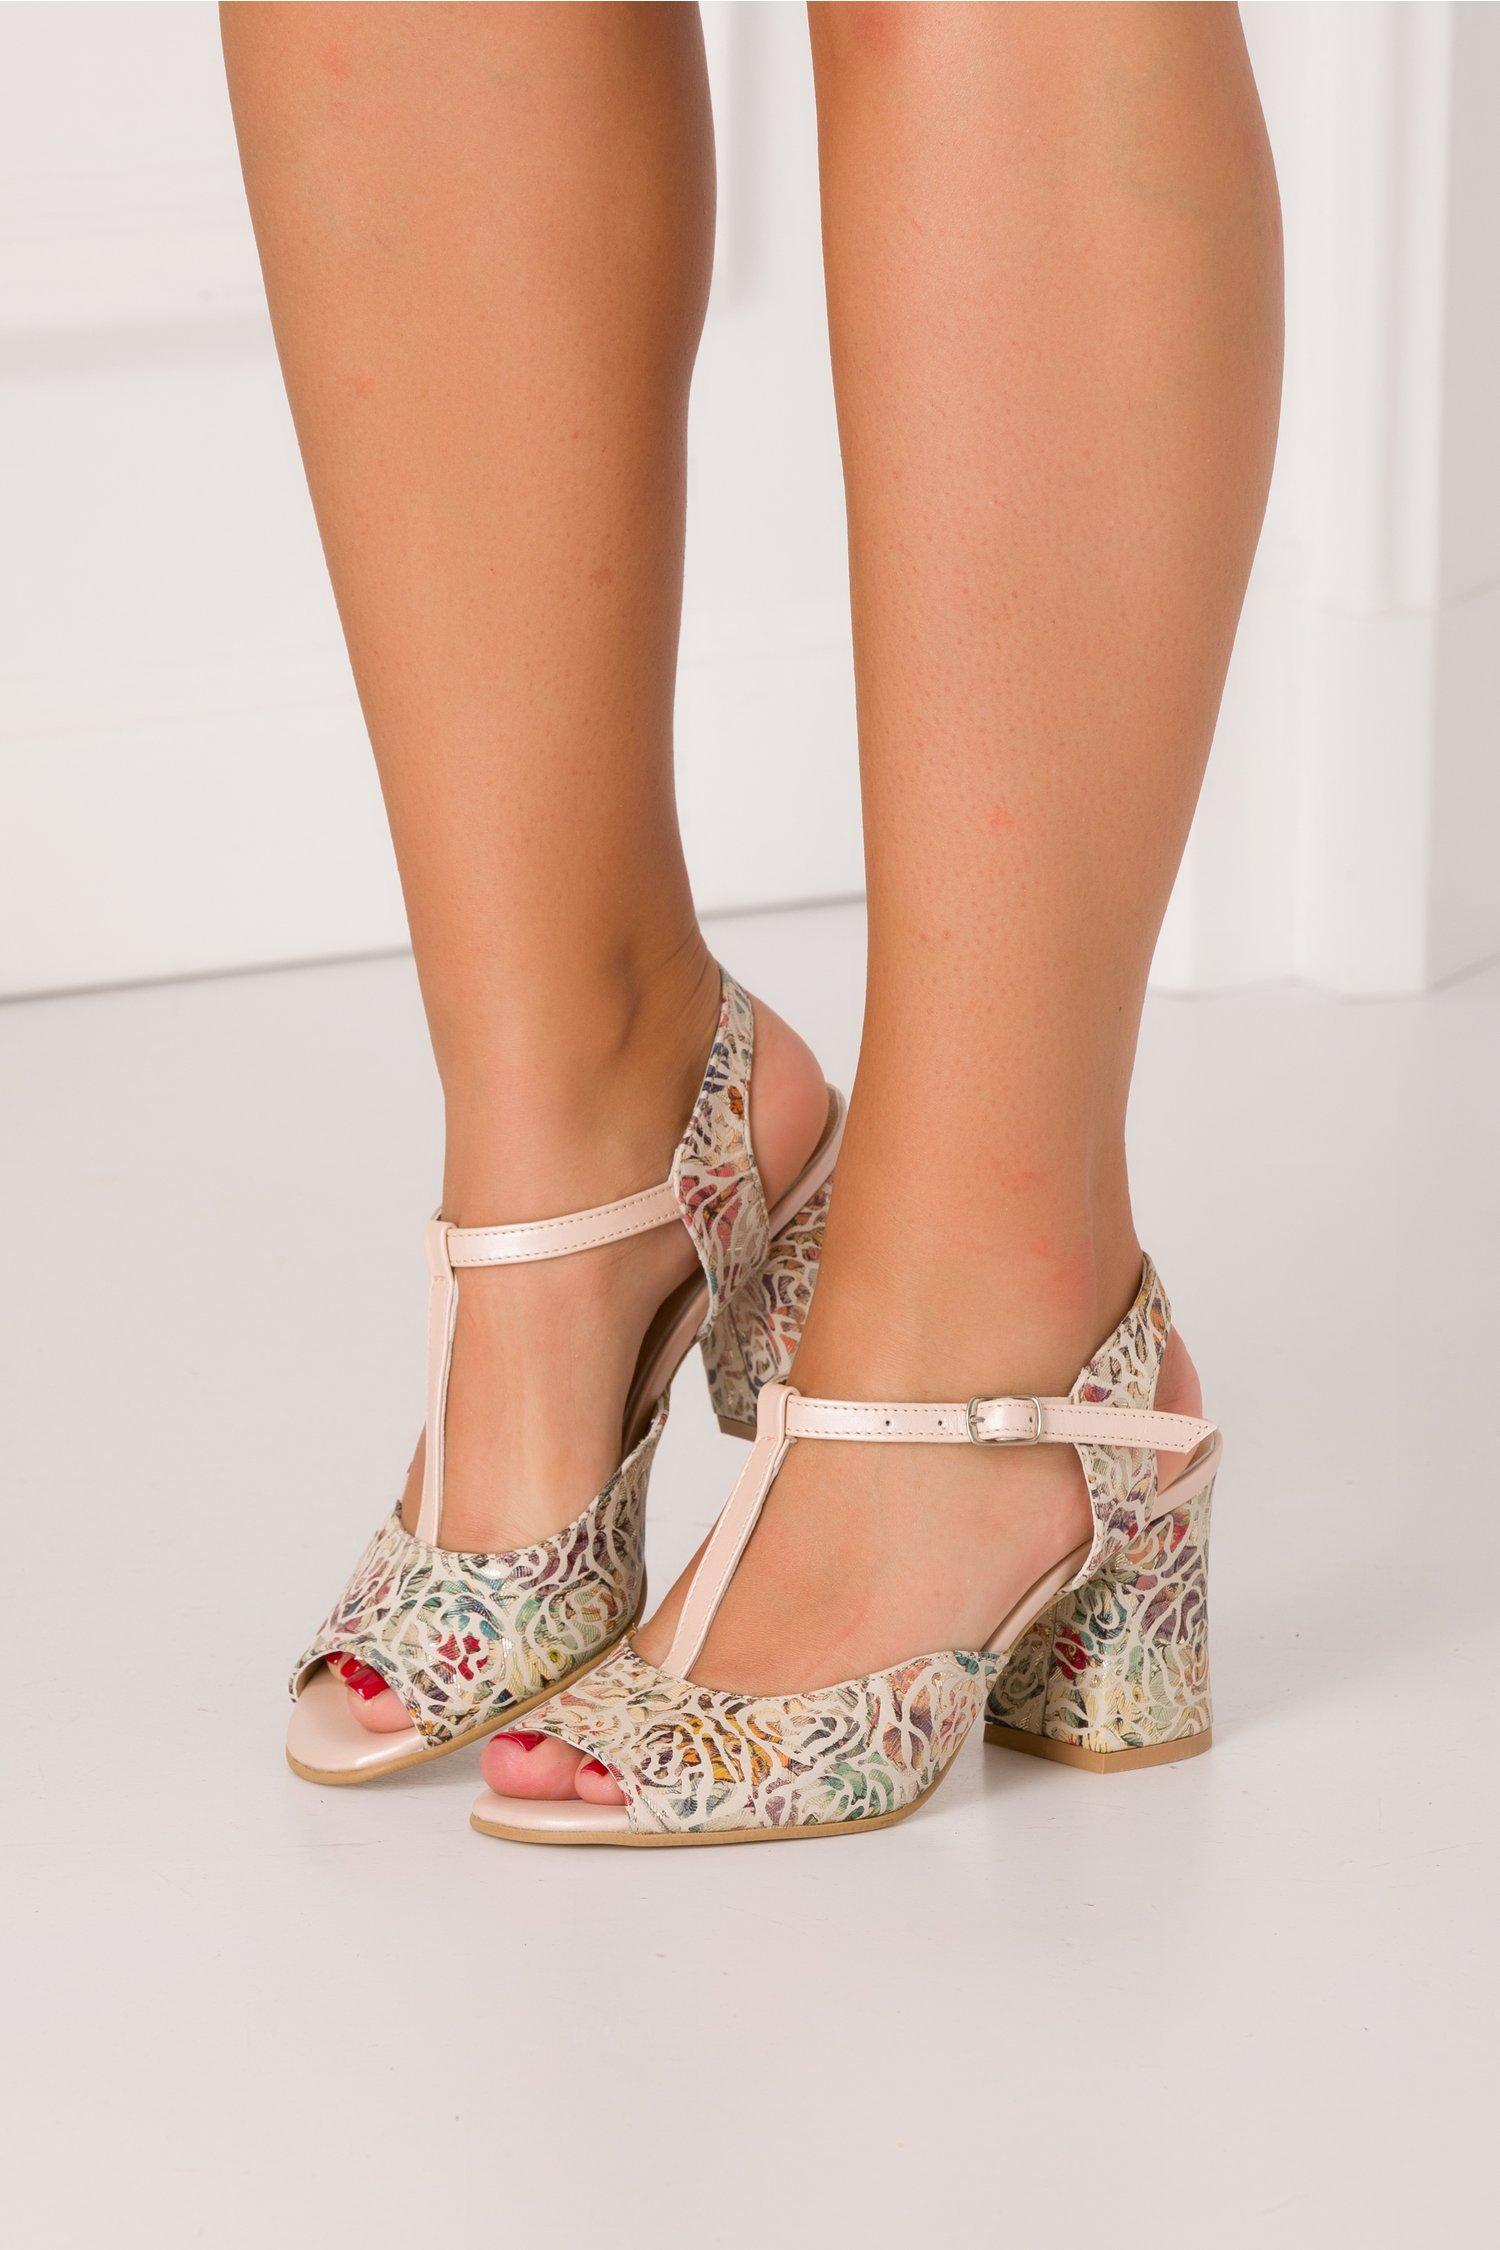 Sandale bej cu imprimeu floral auriu